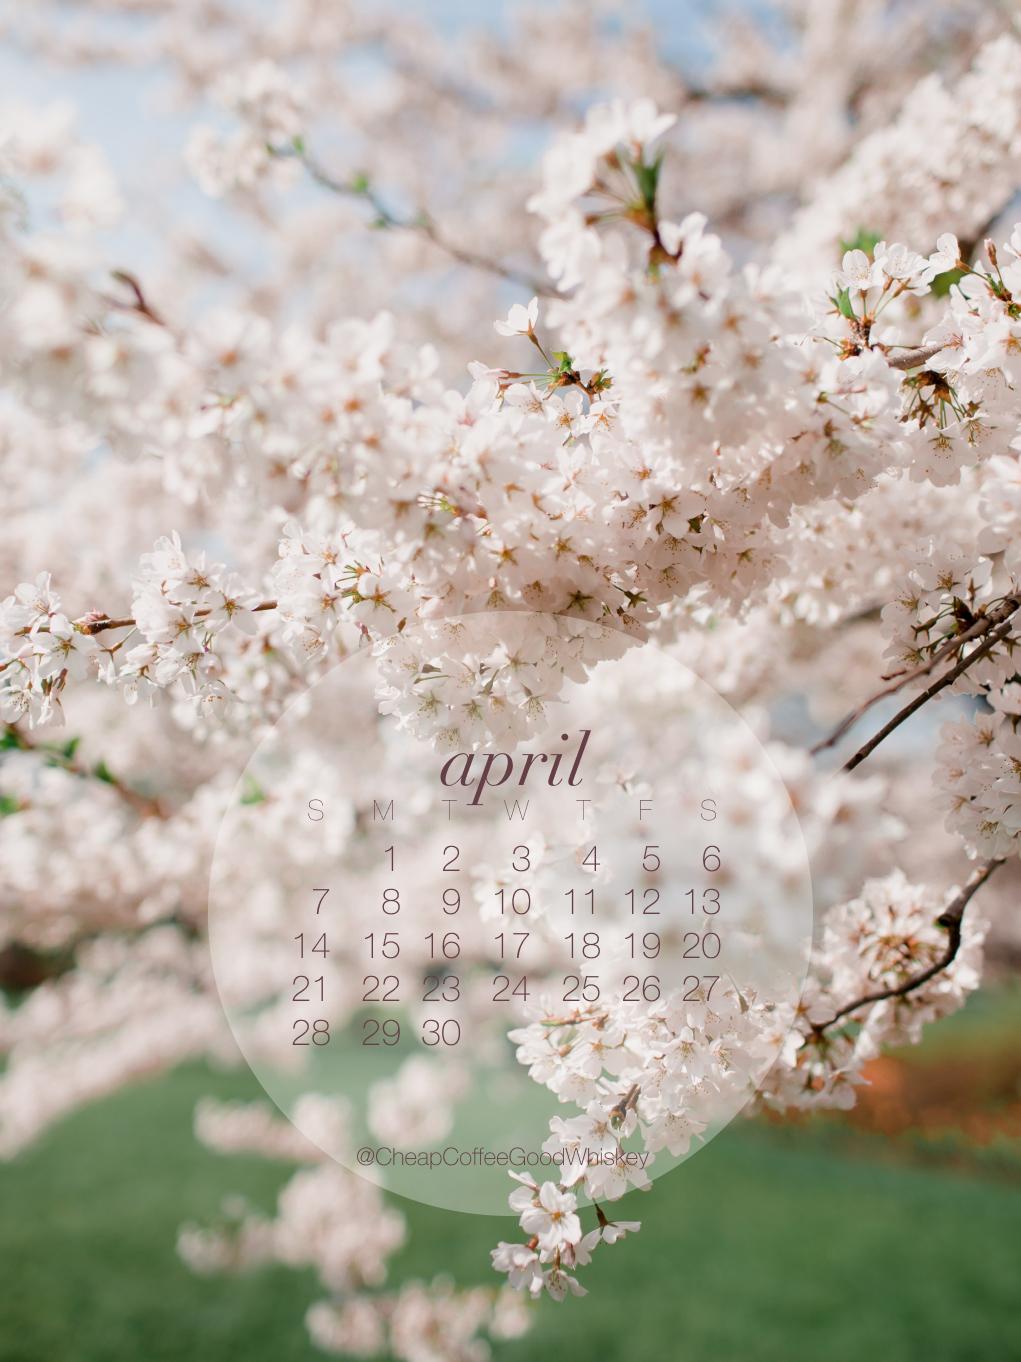 April 2019 Calendar 7.jpg